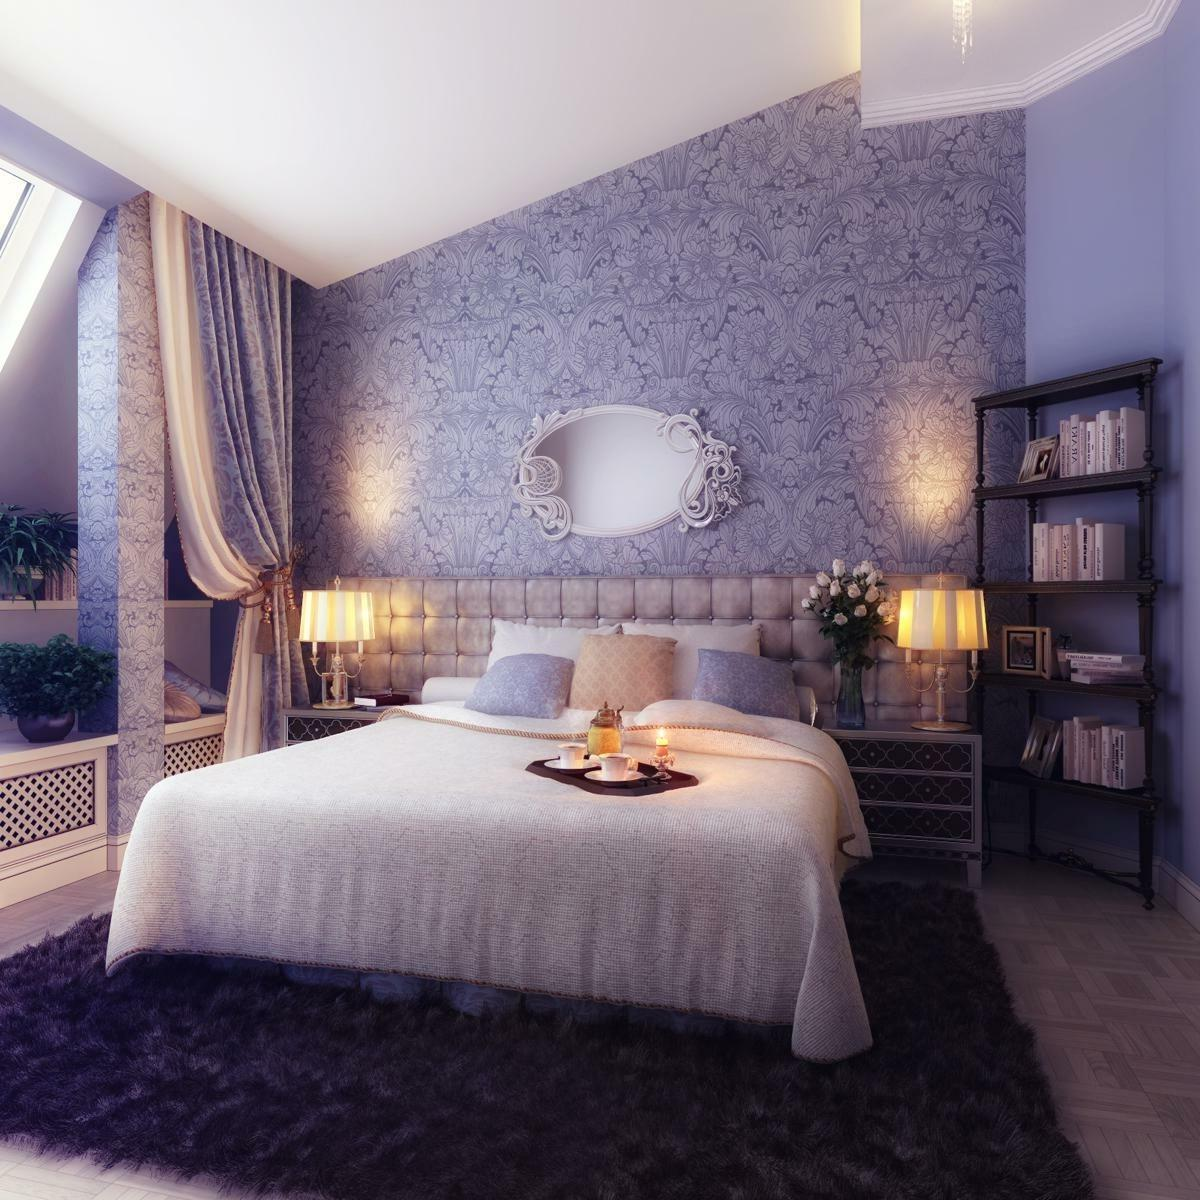 صوره صور ديكورات غرف نوم , اجمل صور الديكور لغرف النوم